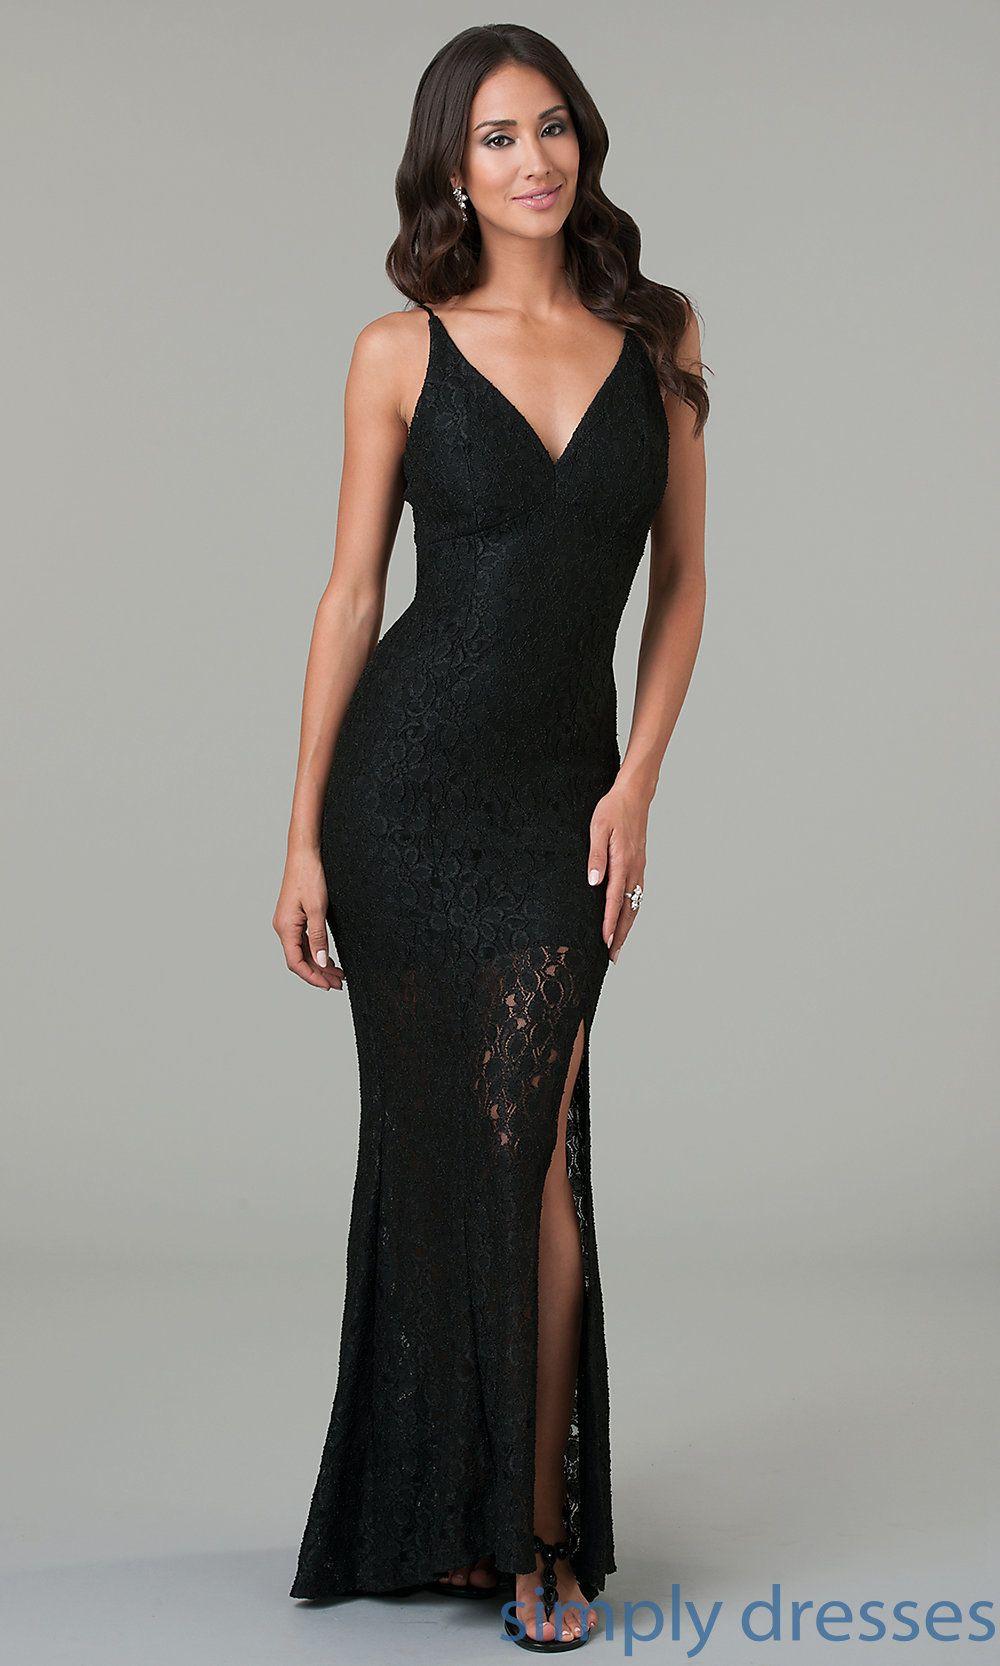 Shop Simply Dresses for black lace evening dresses. Wear open back ...